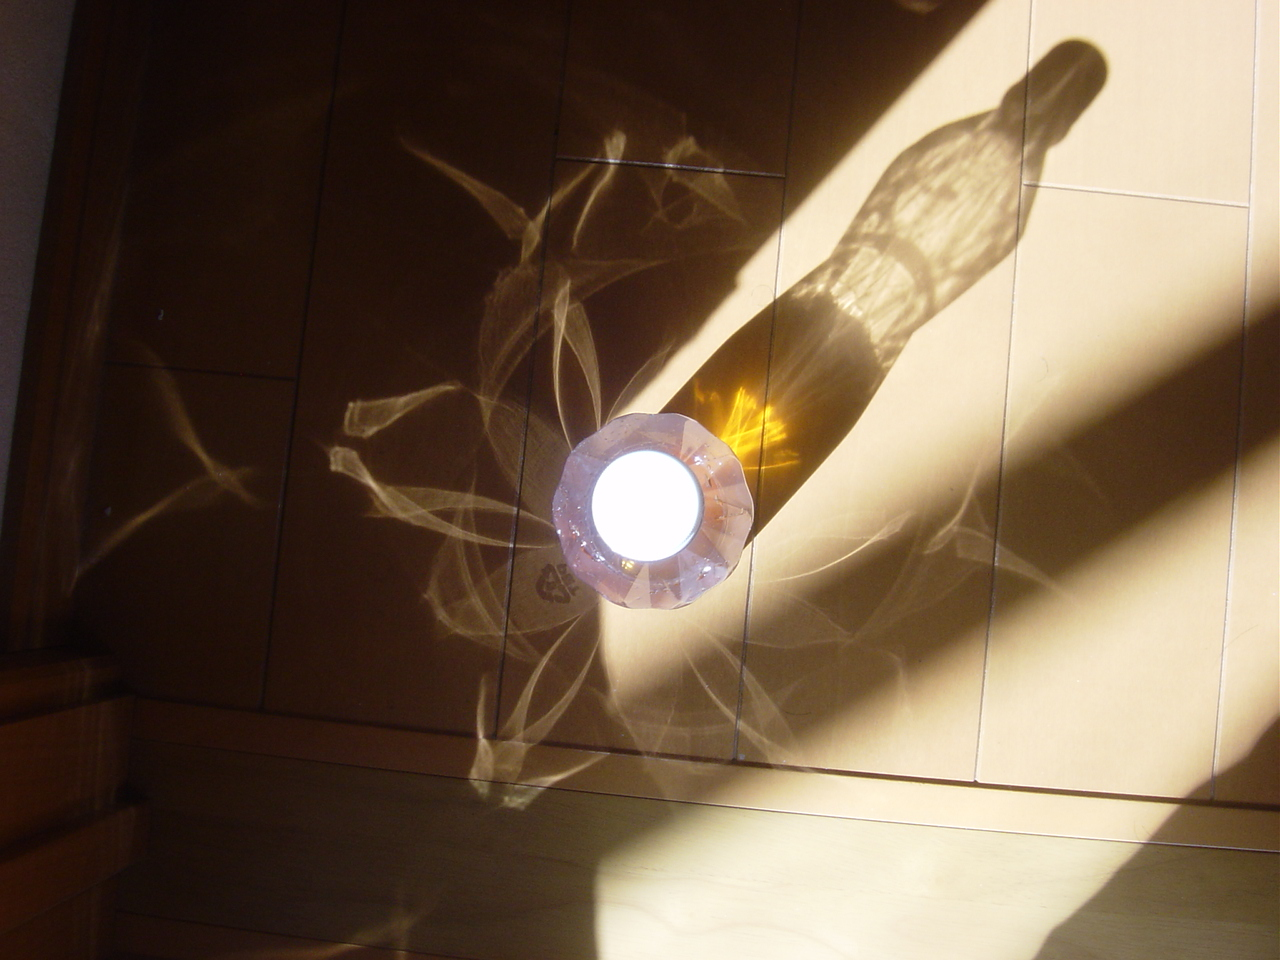 f:id:Df-kyounoyume-Sneonstiamlegnita:20111107114820j:plain